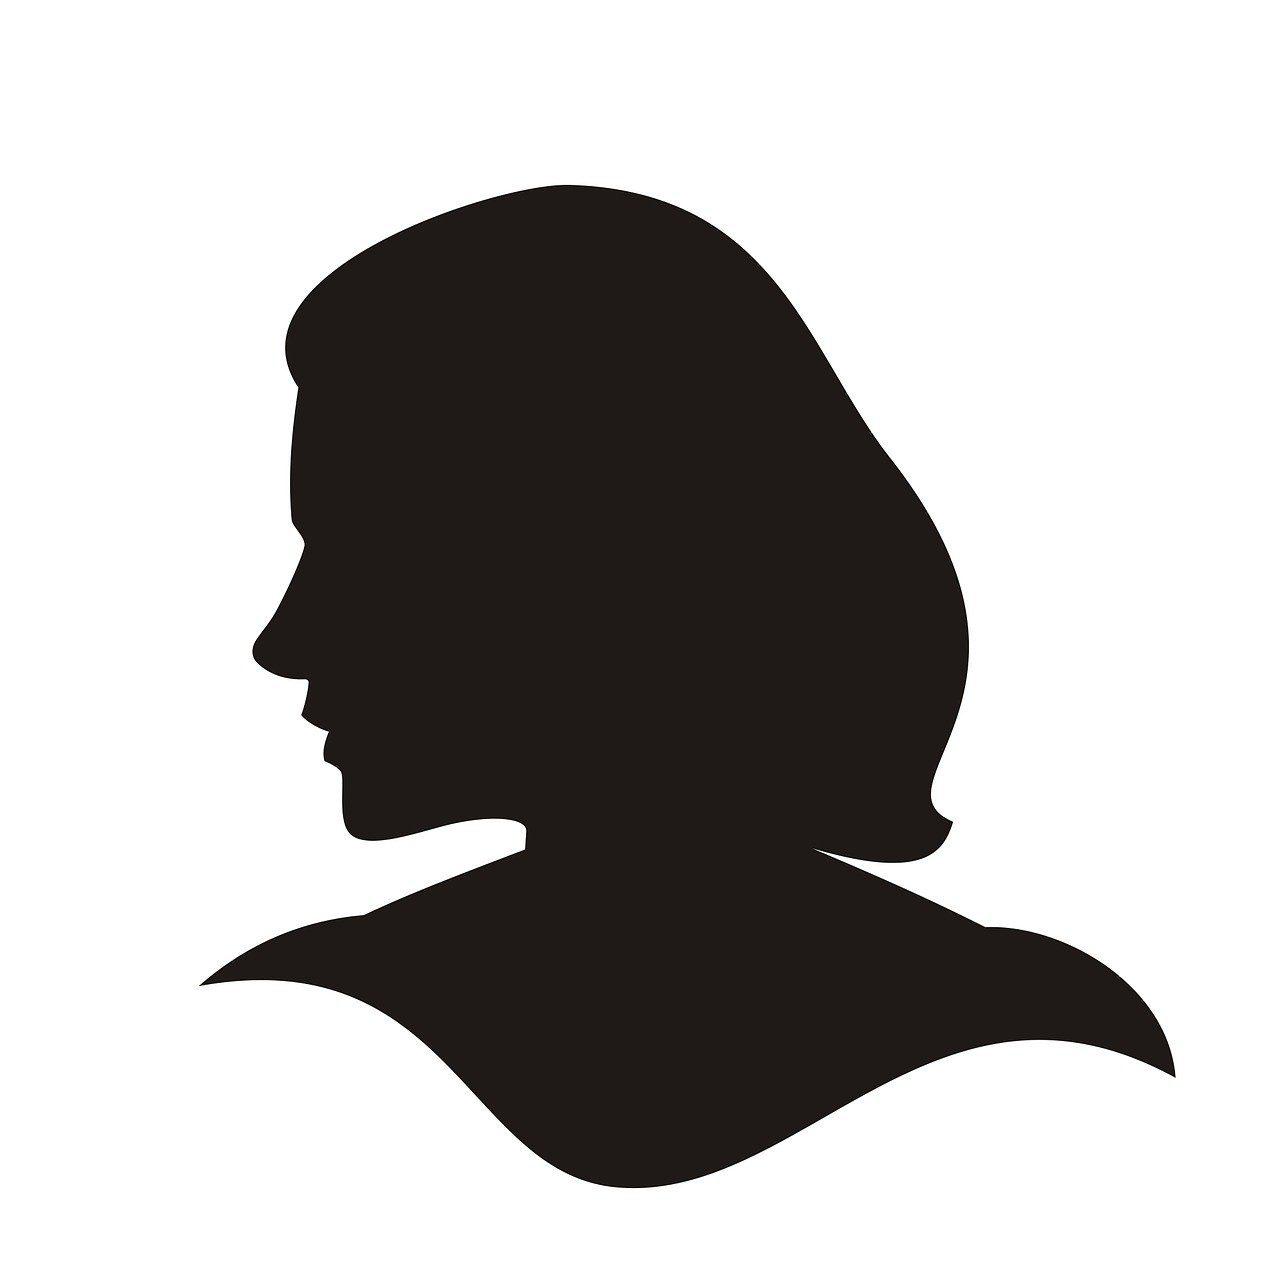 silhouette, head cameo, woman-988831.jpg